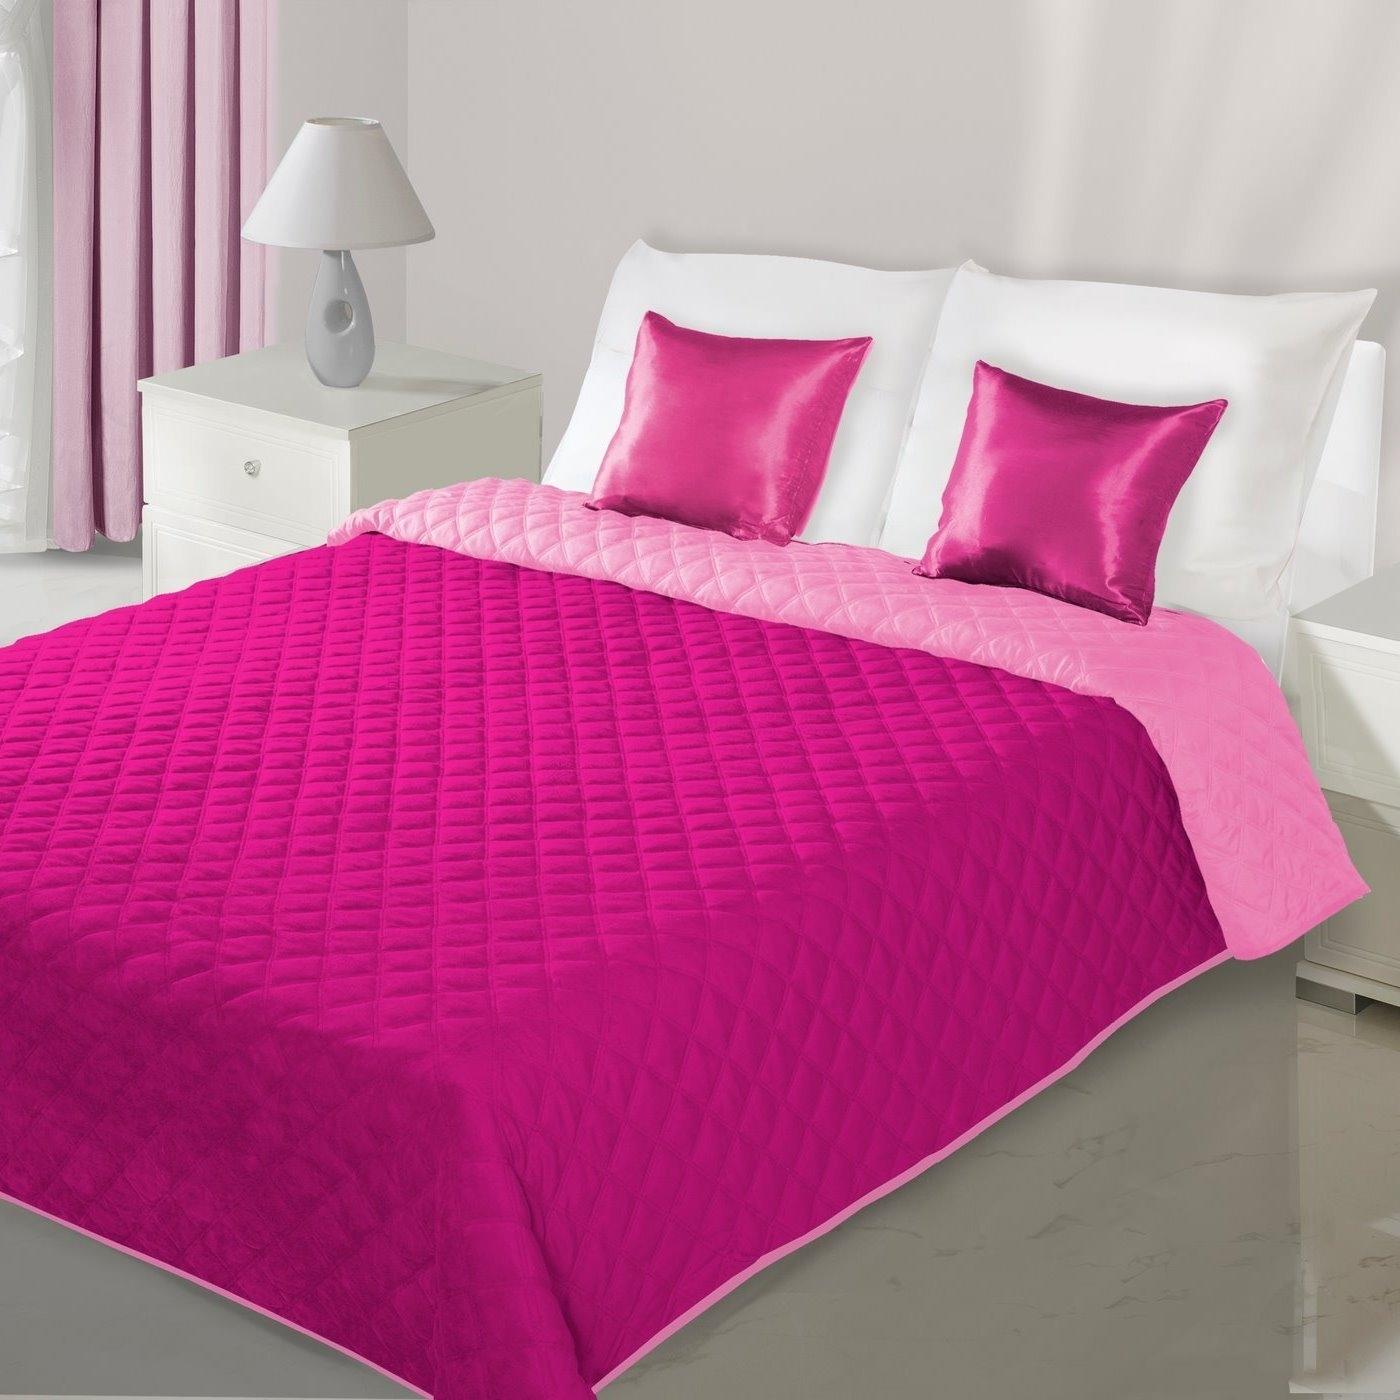 Cuvertura reversibila Evita Dark Pink / Light Pink, 220 x 240 cm